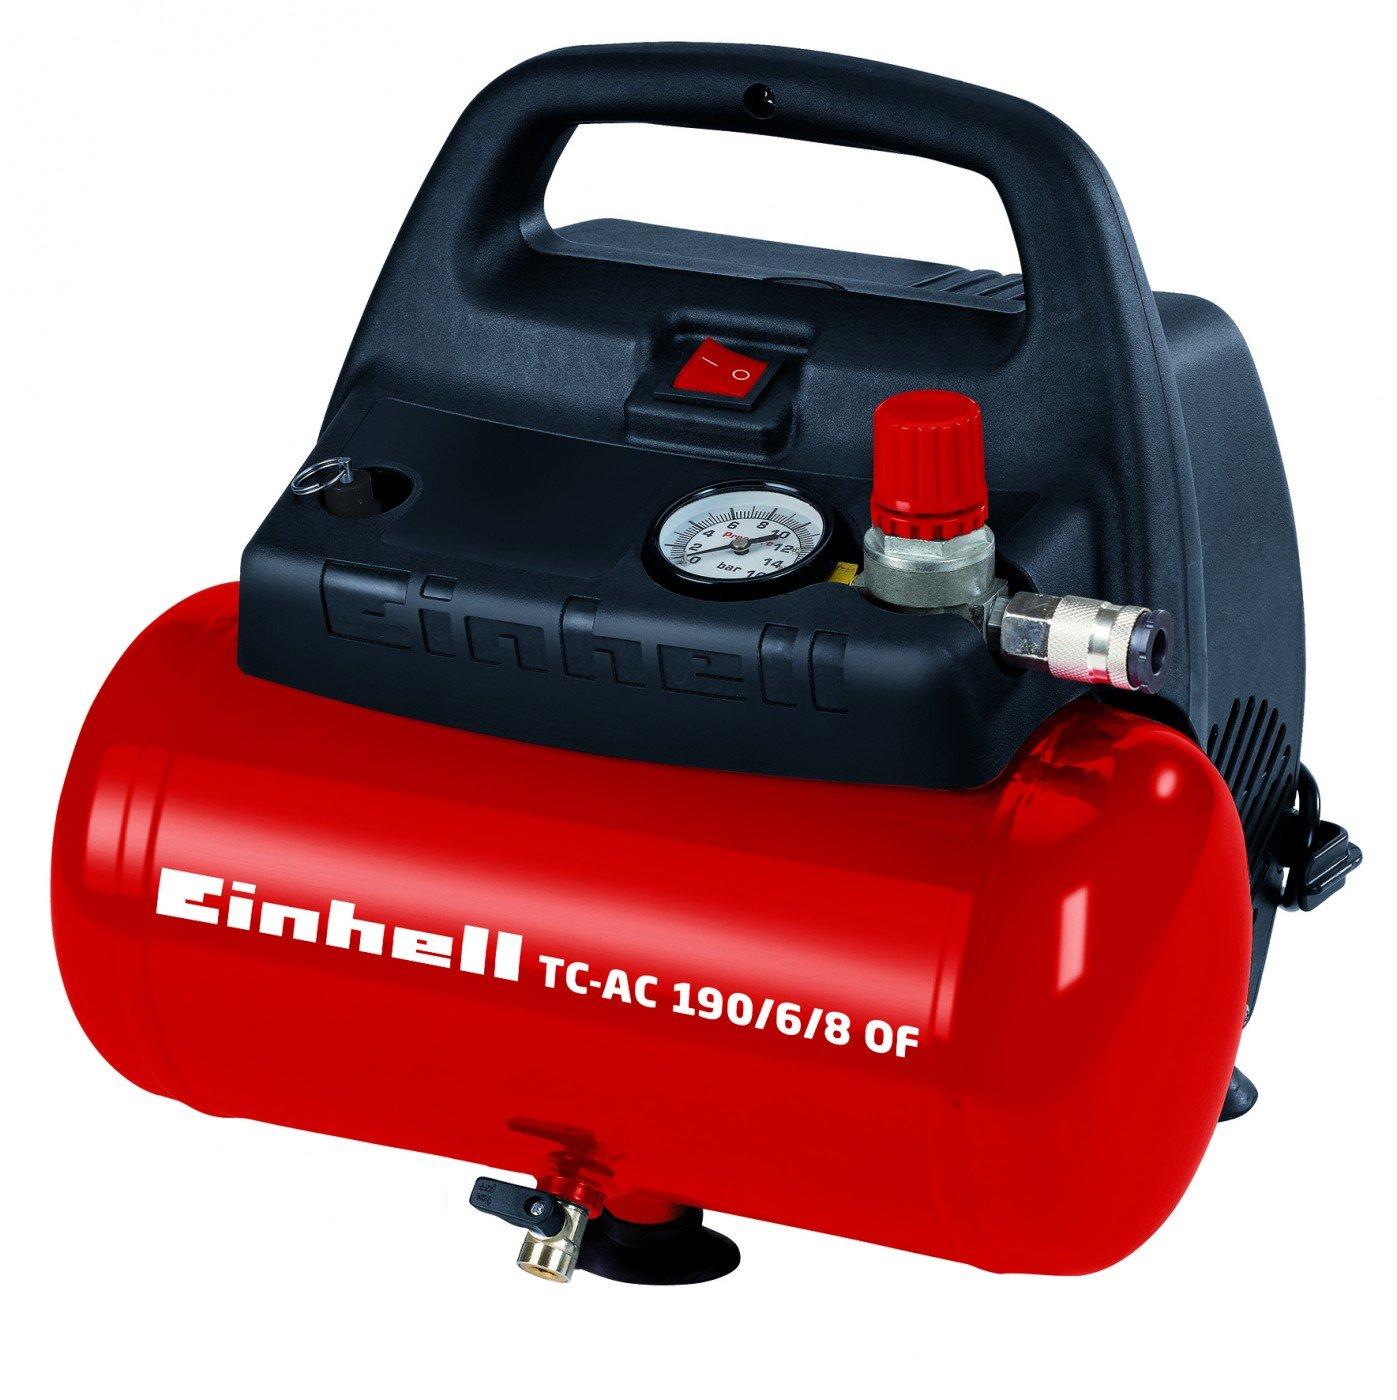 Kompressor 6 liter / 8 bar - TC-AC 190/6/8 OF